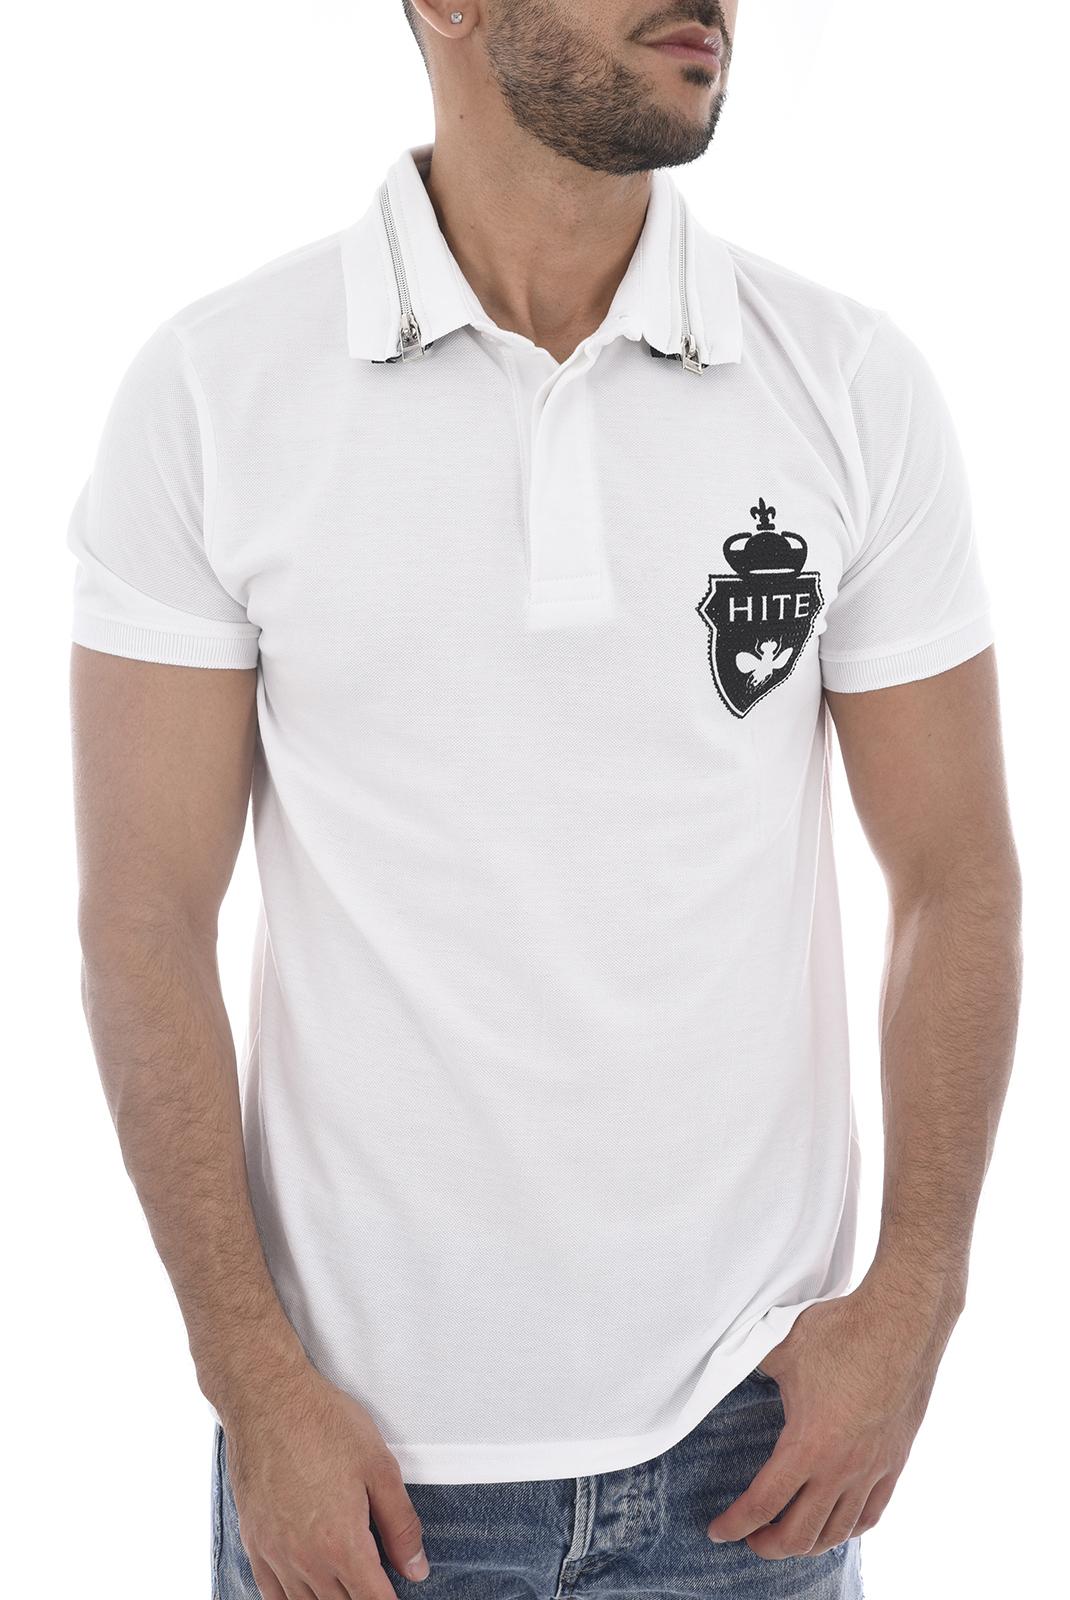 Tee-shirts  Hite couture PRISIER BLANC